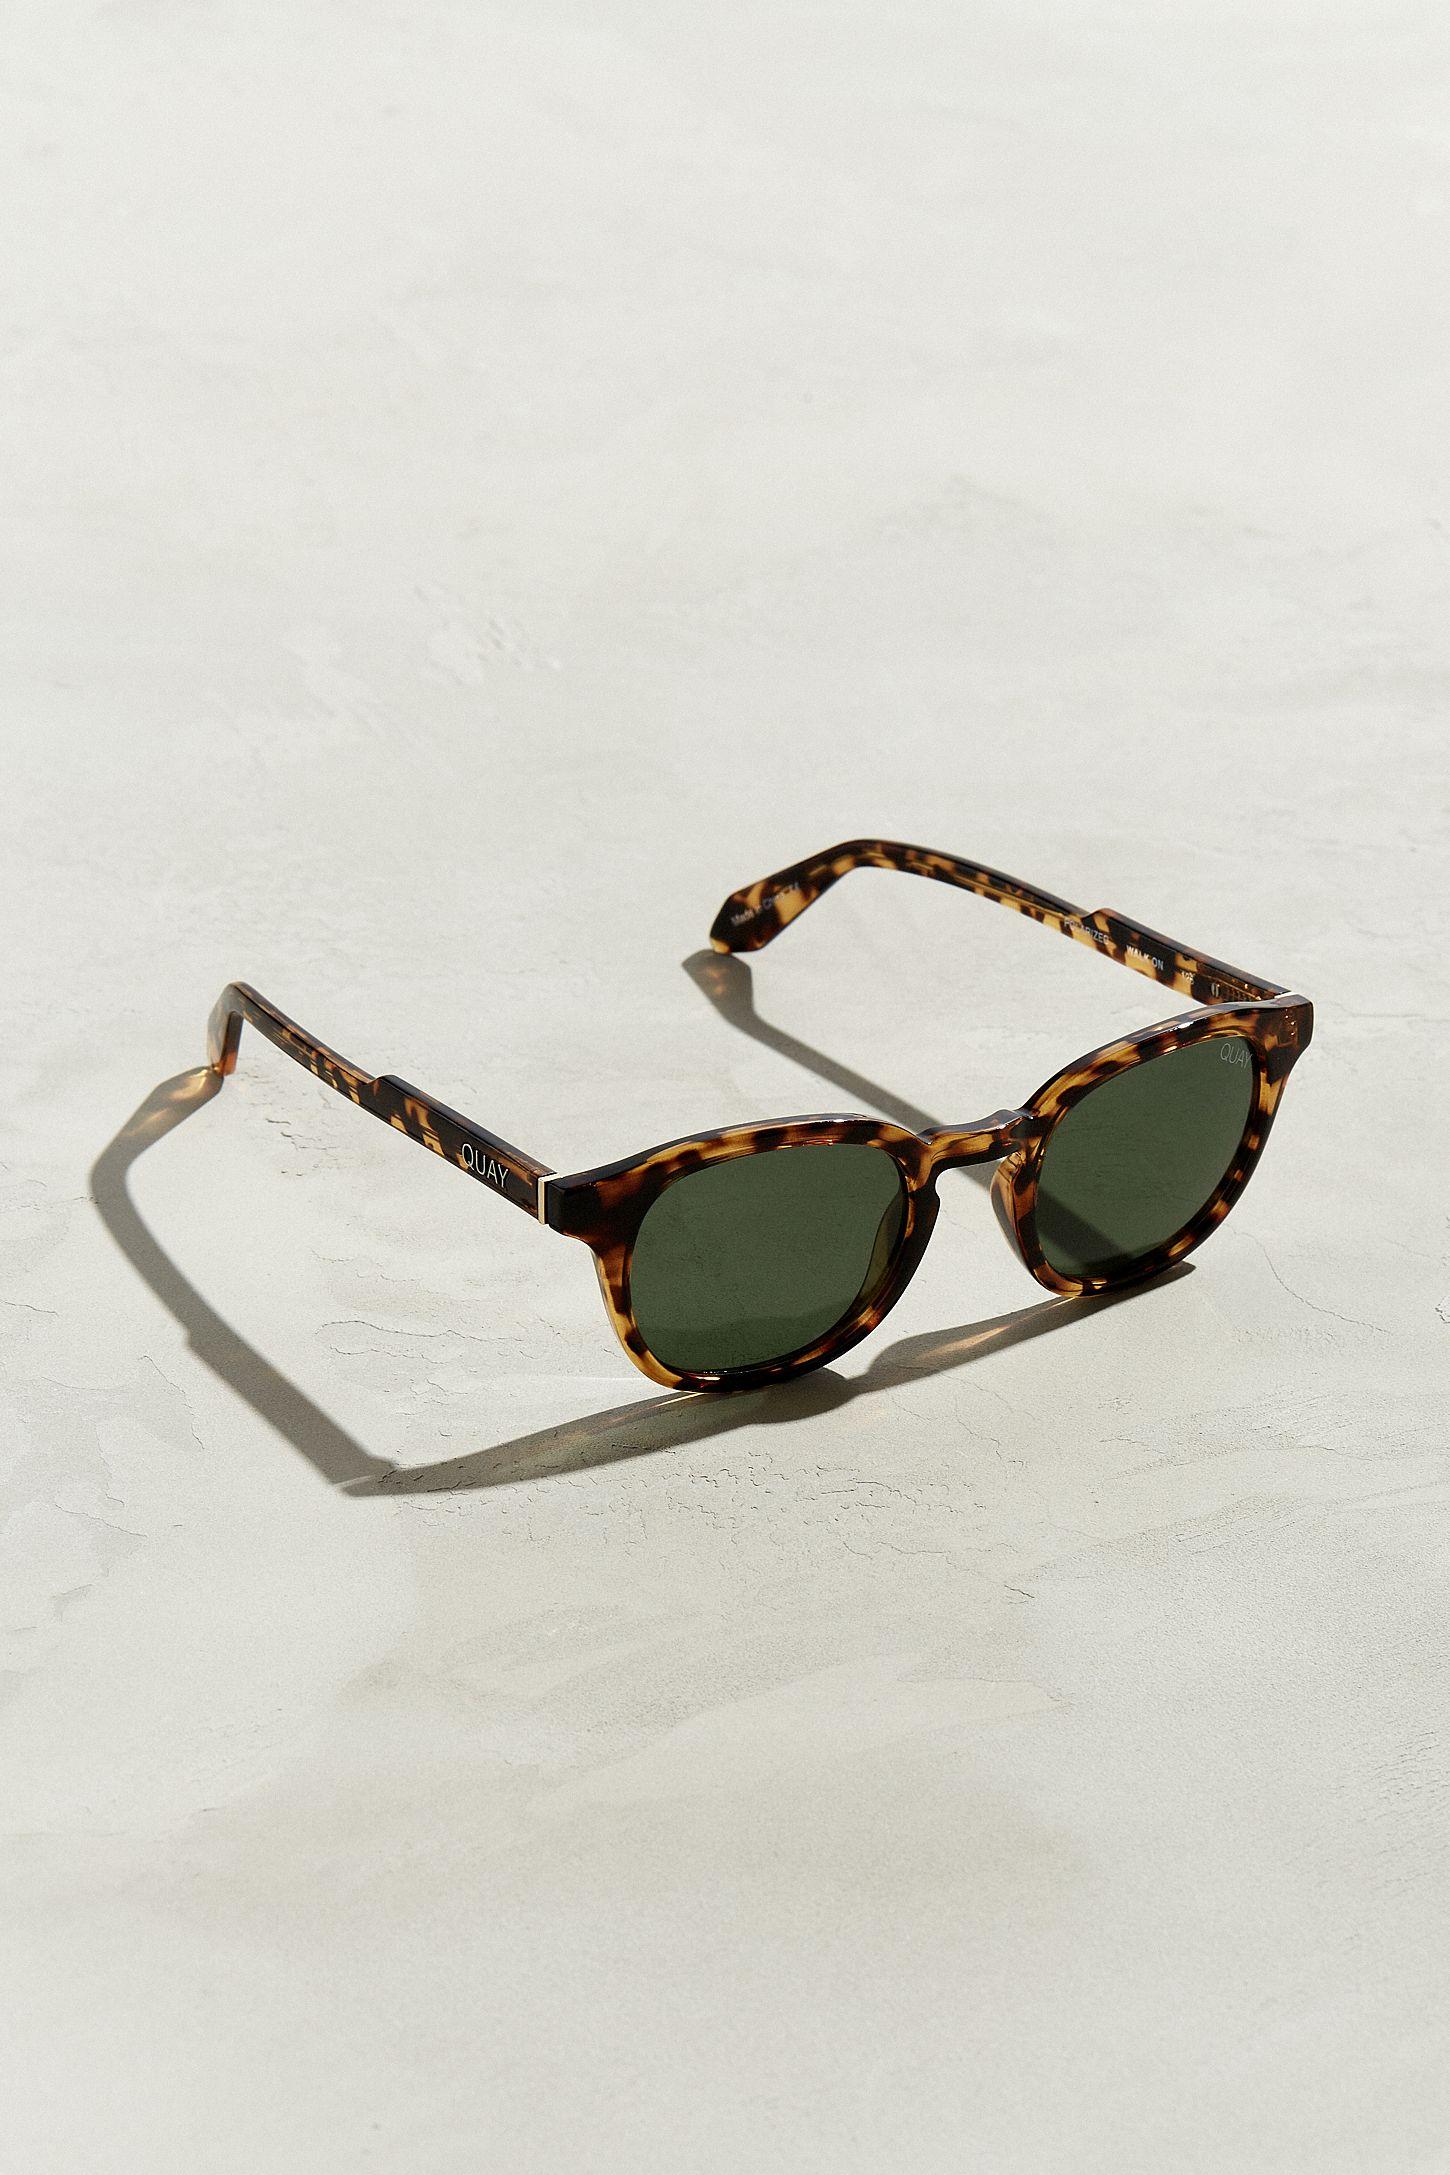 d03f070053b77 Quay Walk On Sunglasses